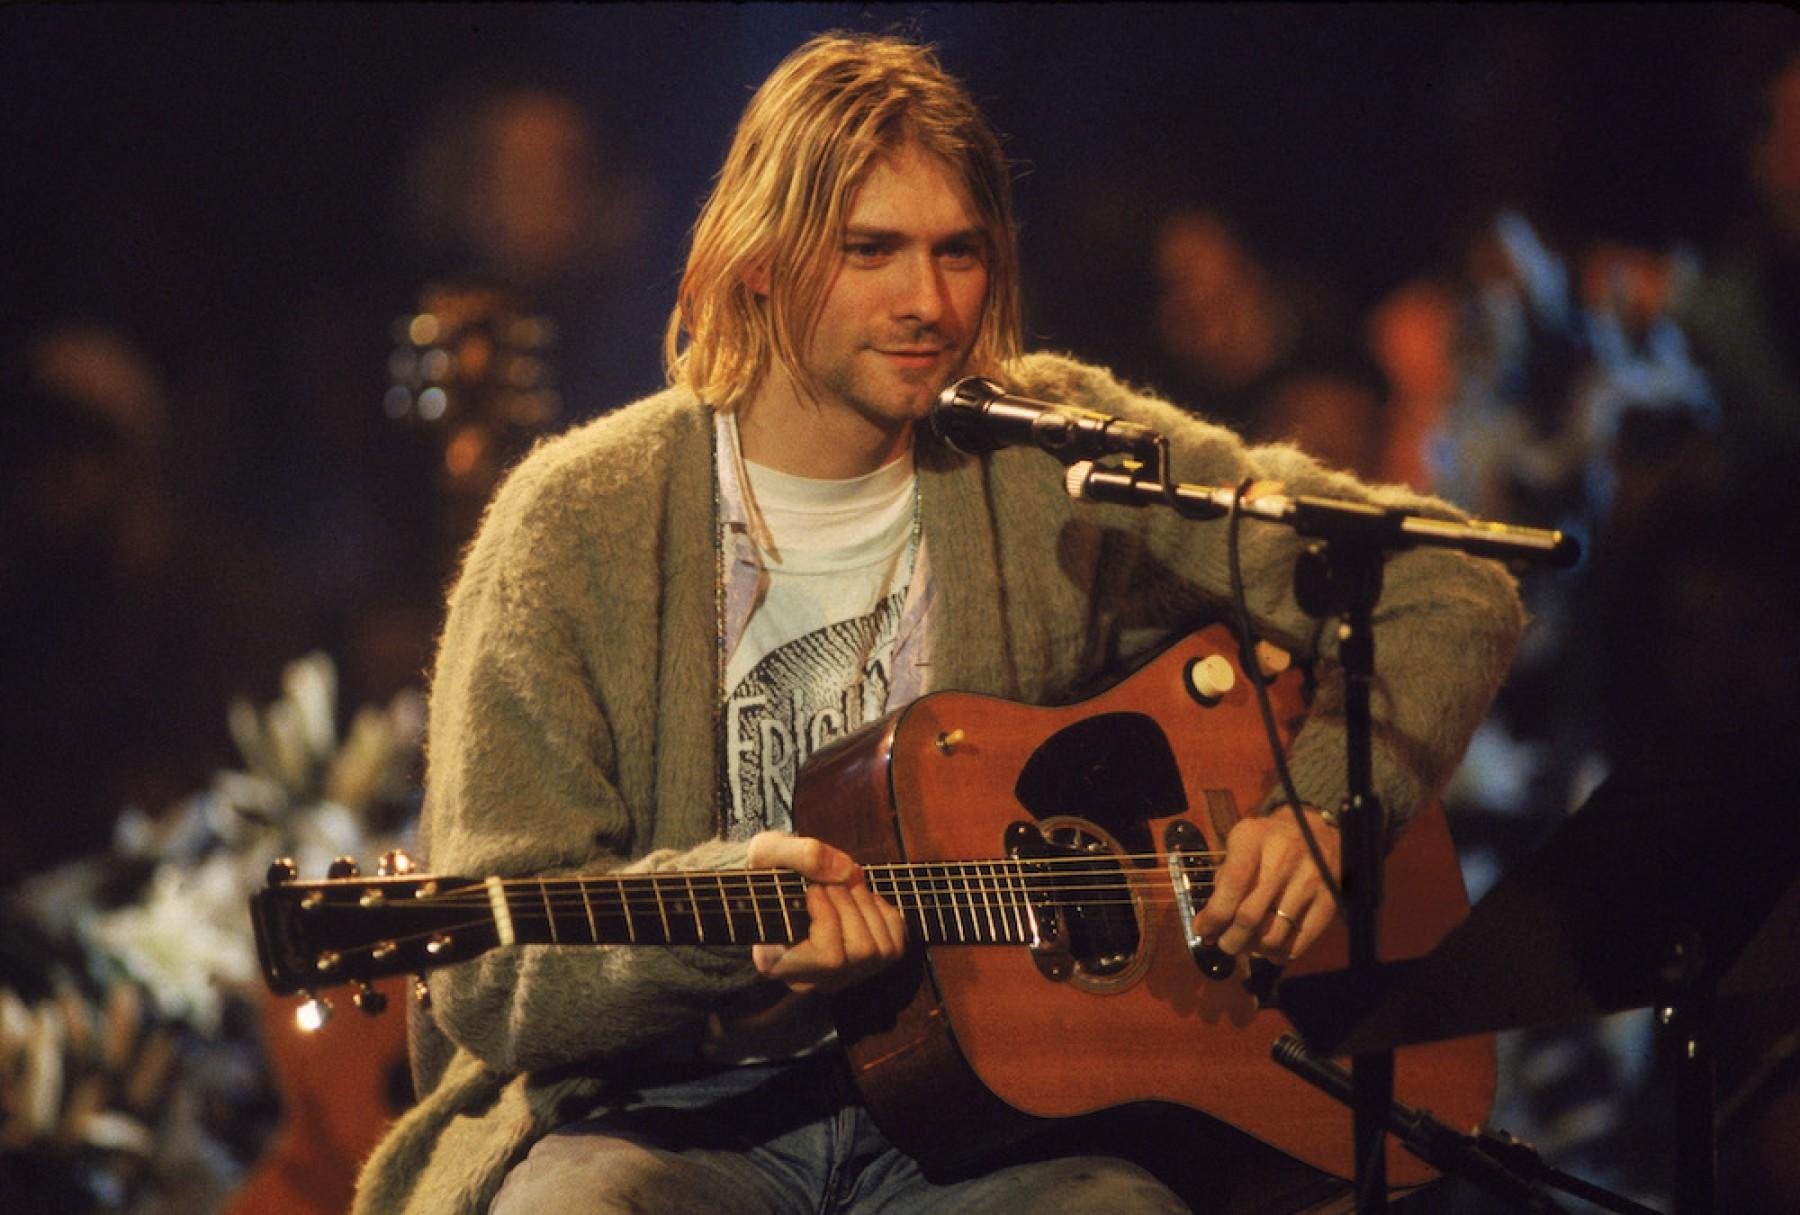 ¿Fanático de Nirvana? Se vendió guitarra de Kurt Cobain